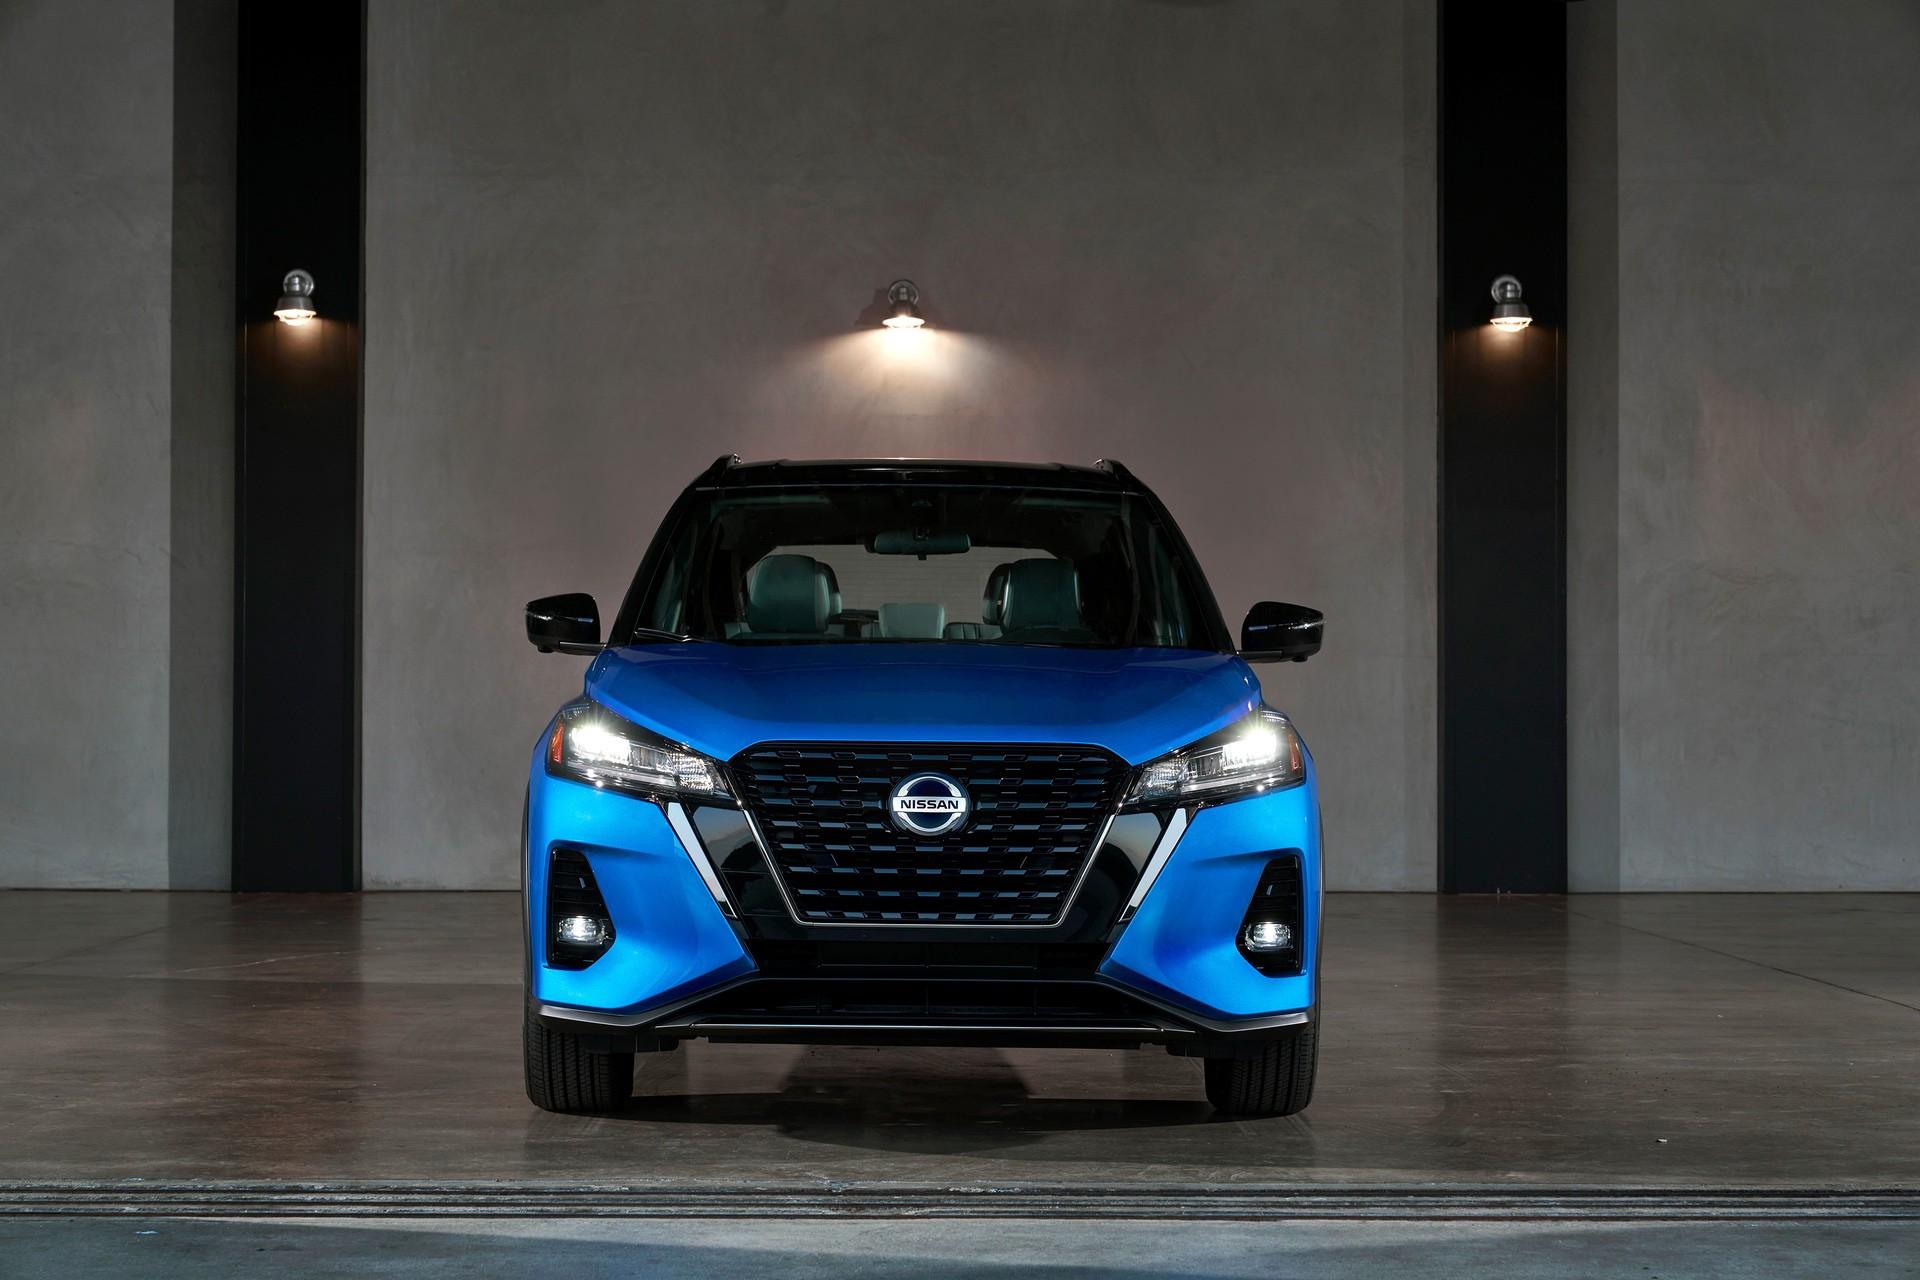 2021-Nissan-Kicks-8